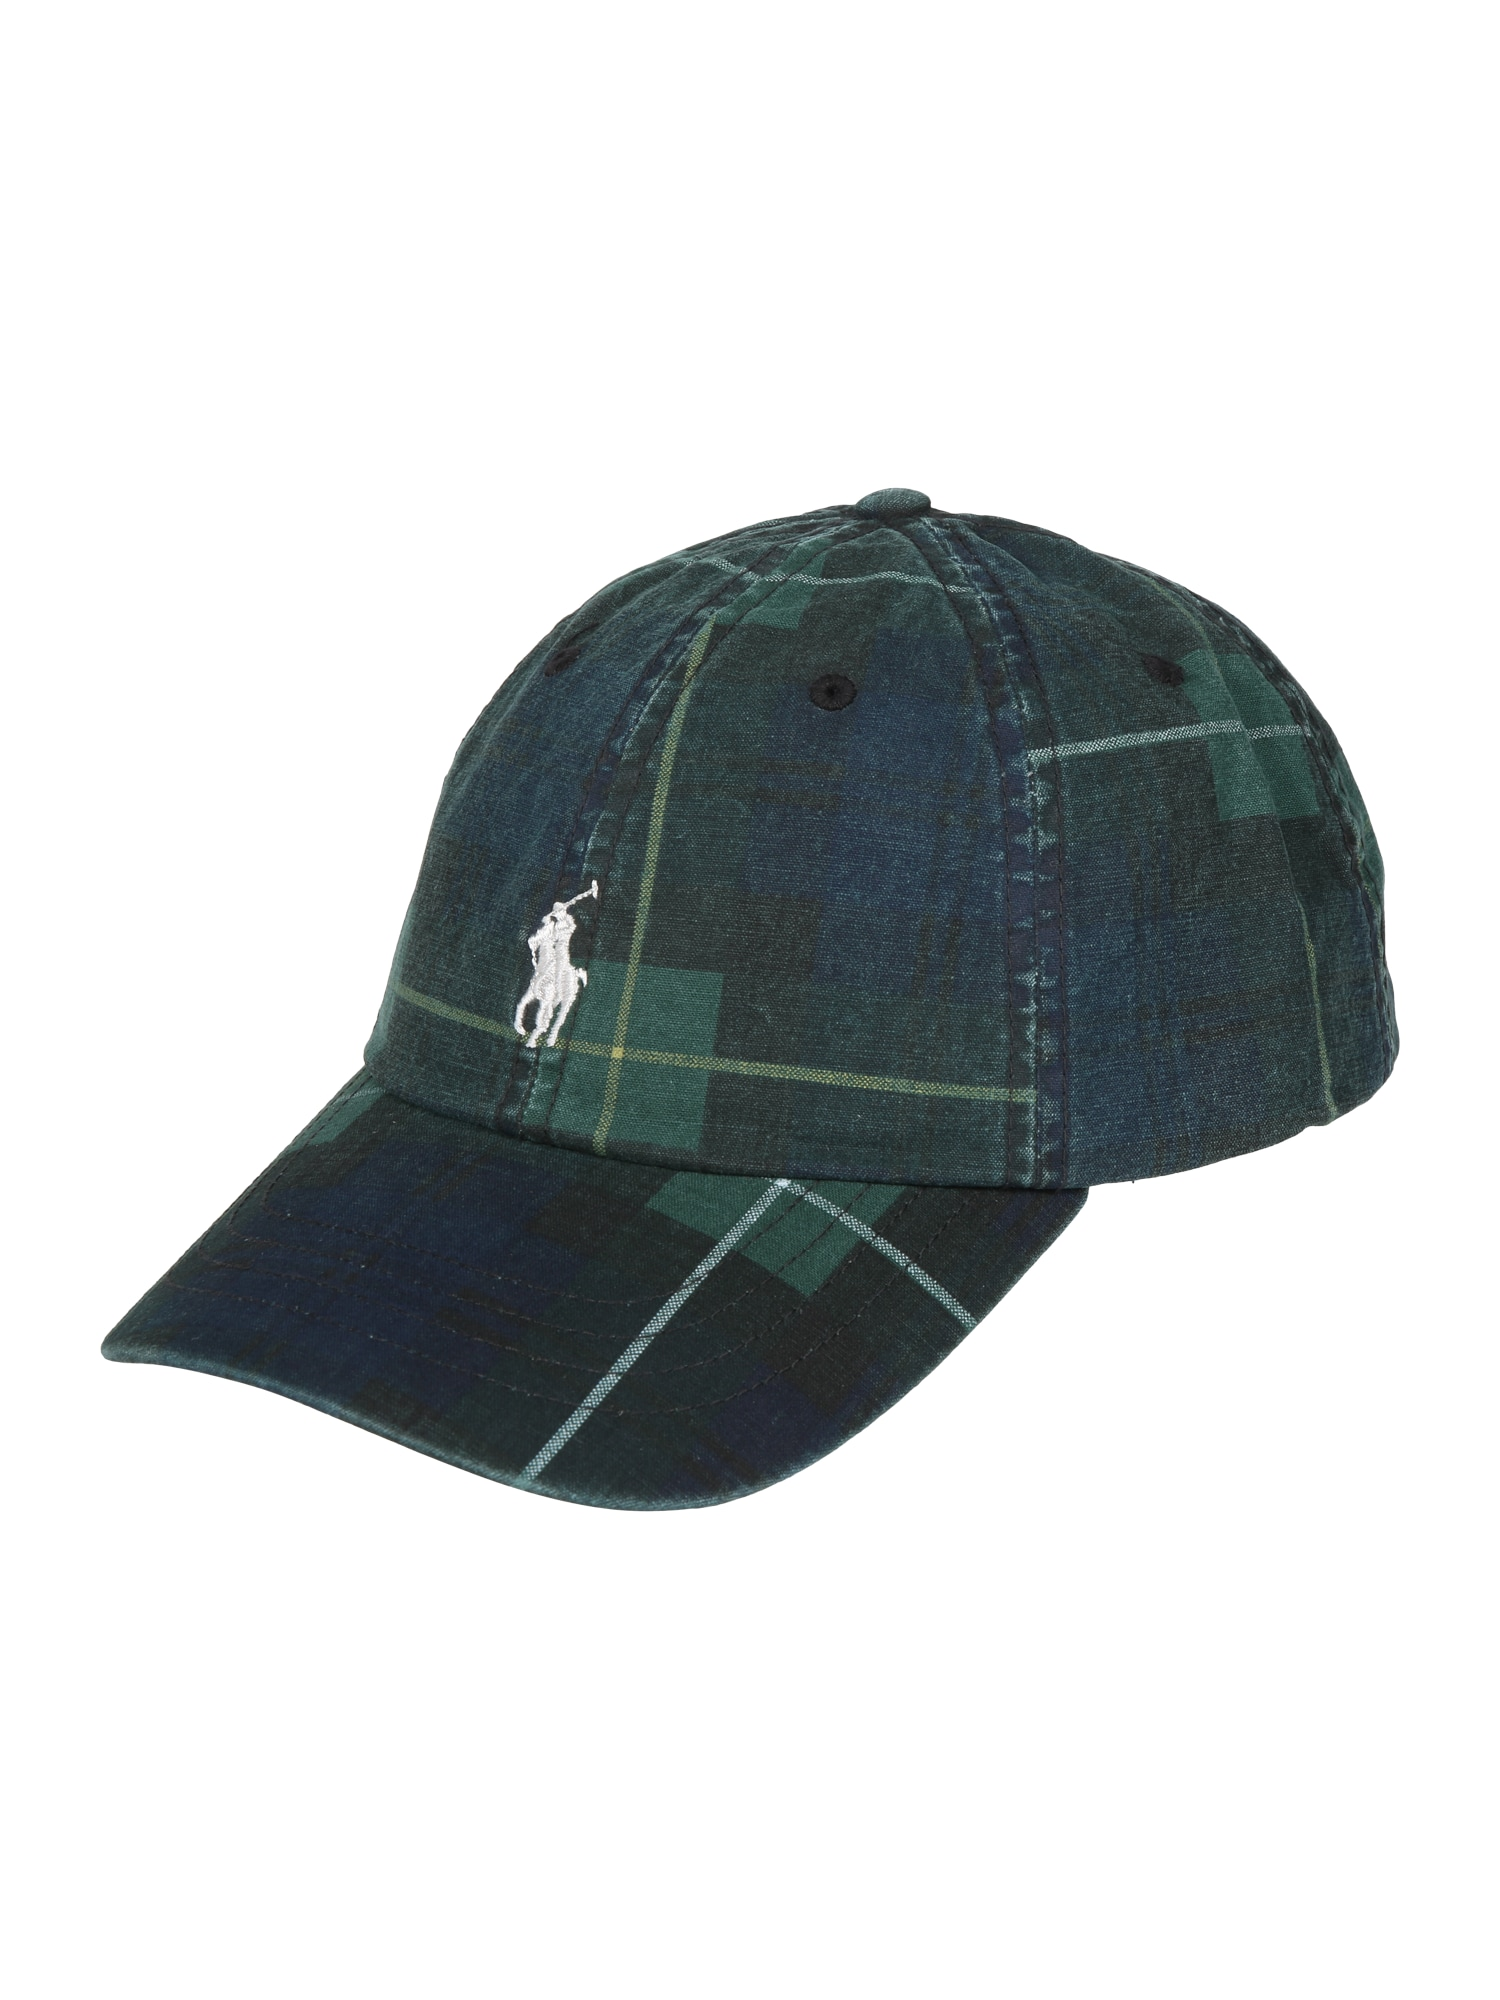 Kšiltovka CLASSIC SPORT CAP krémová POLO RALPH LAUREN